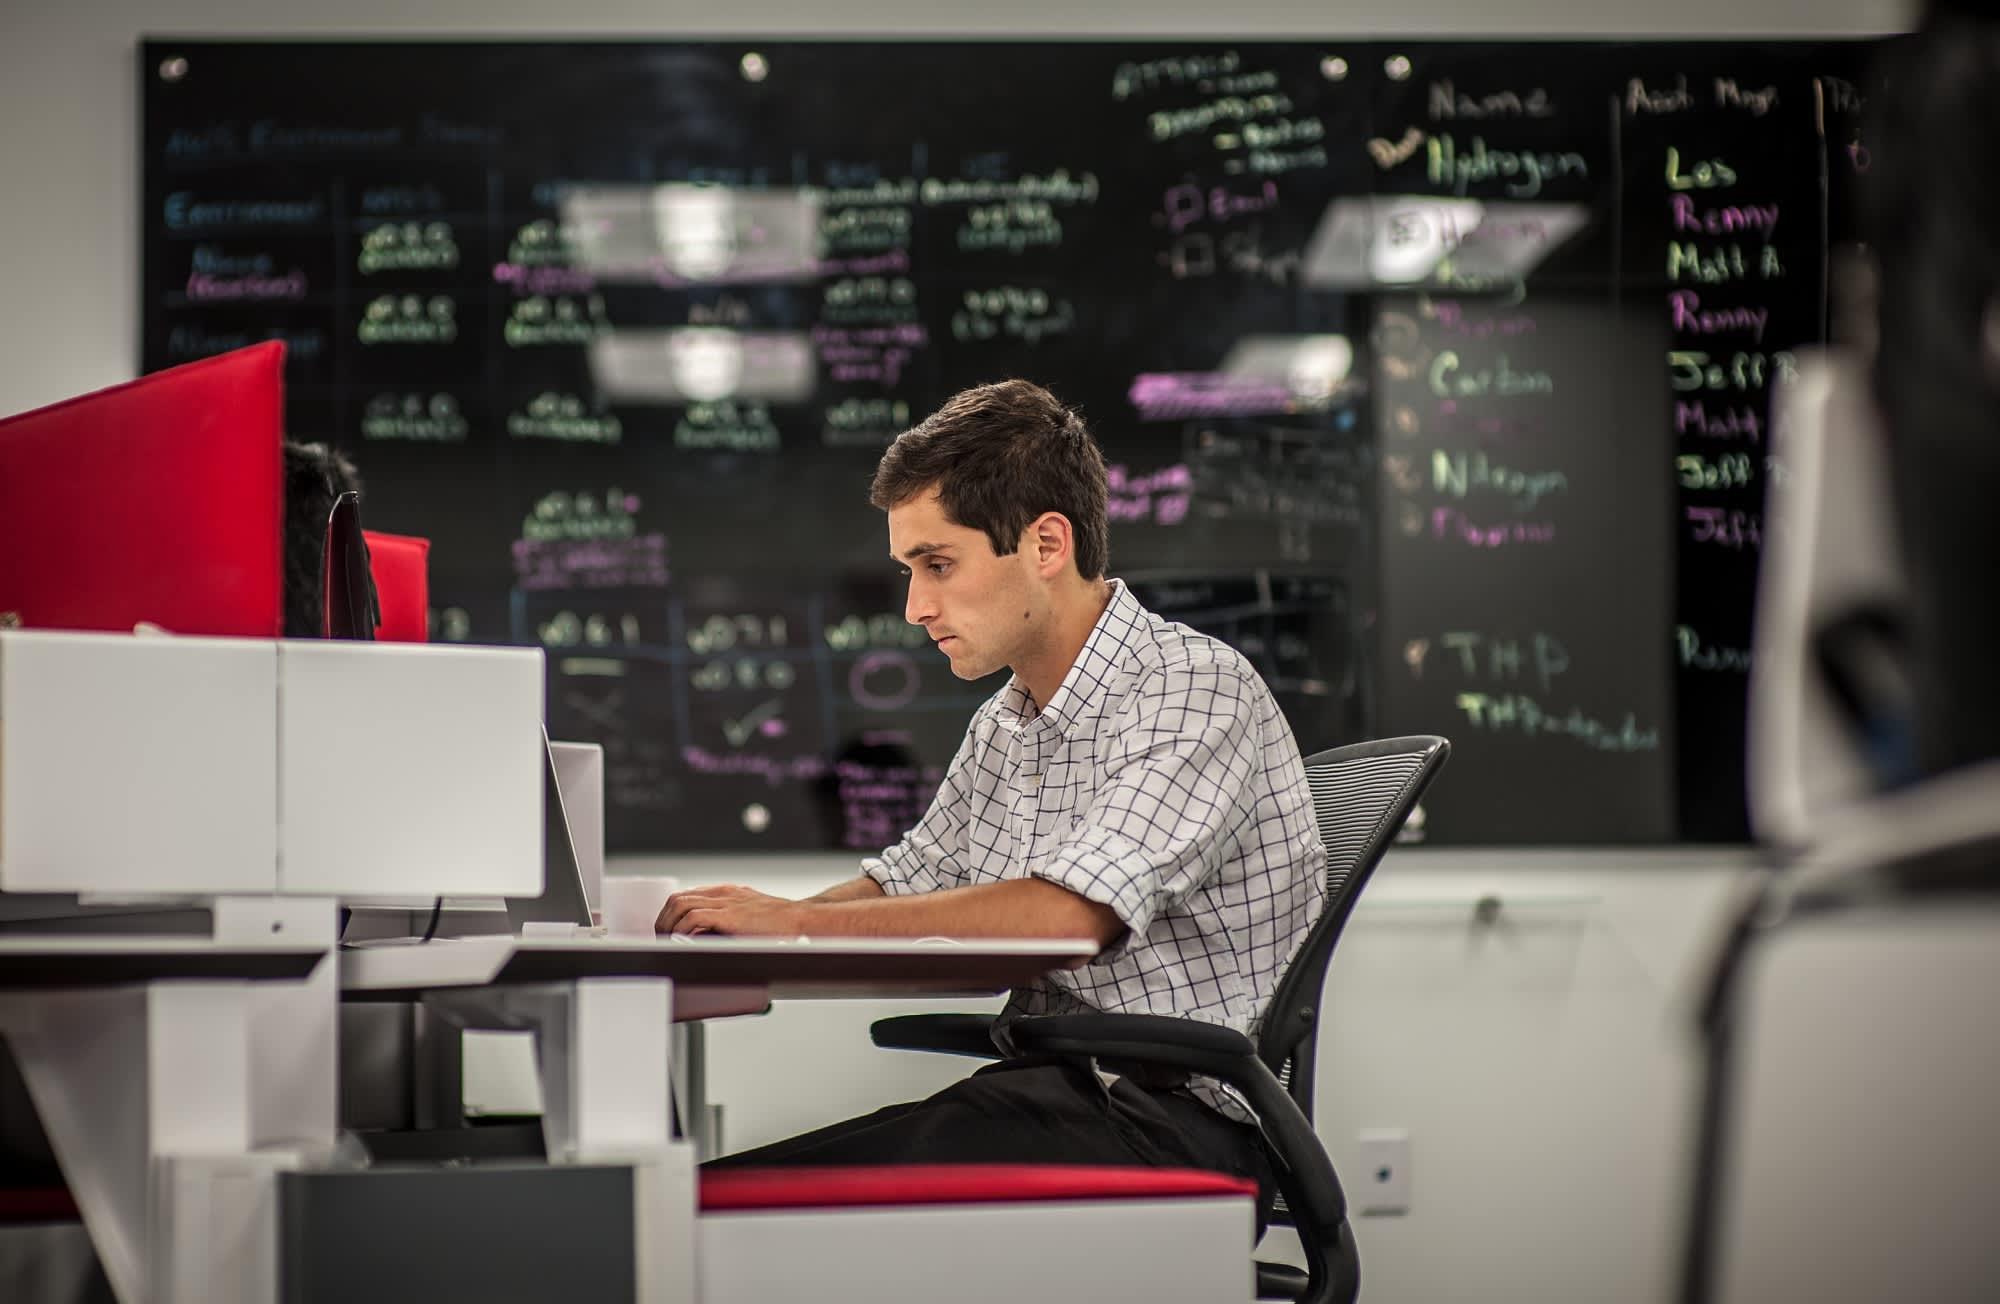 Premium: Data Scientist for Red Owl Analytics